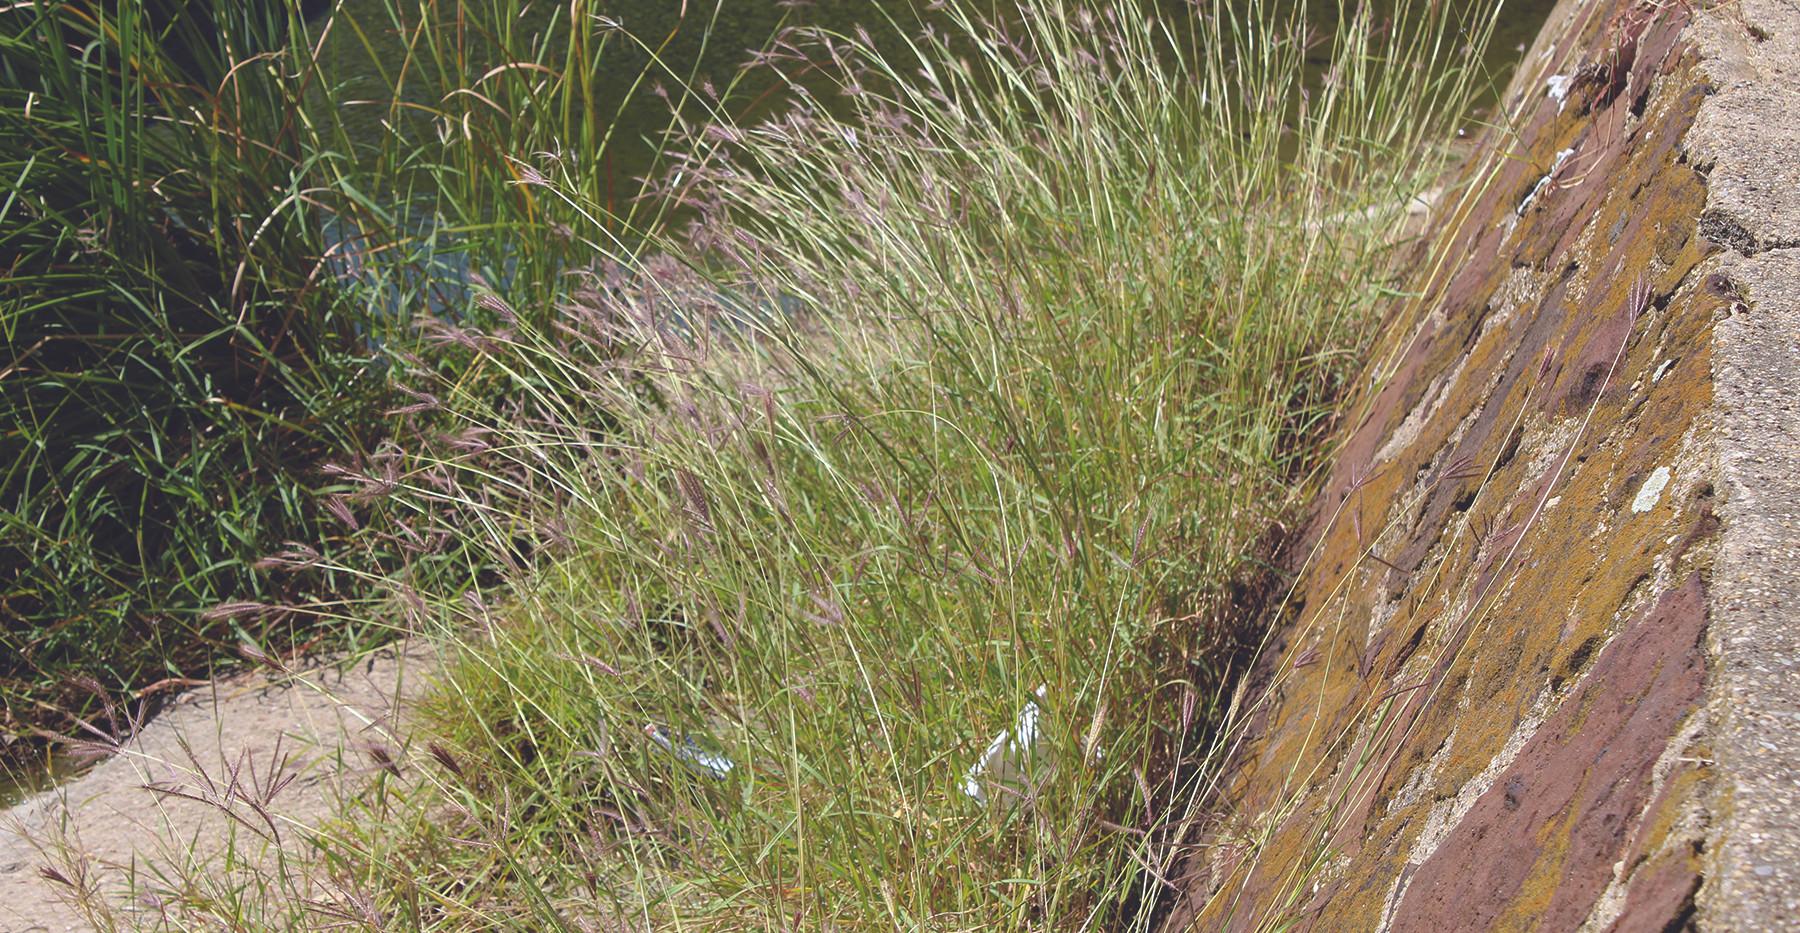 King Ranch Bluestem, Invasive Grass, Abundant in Denton County